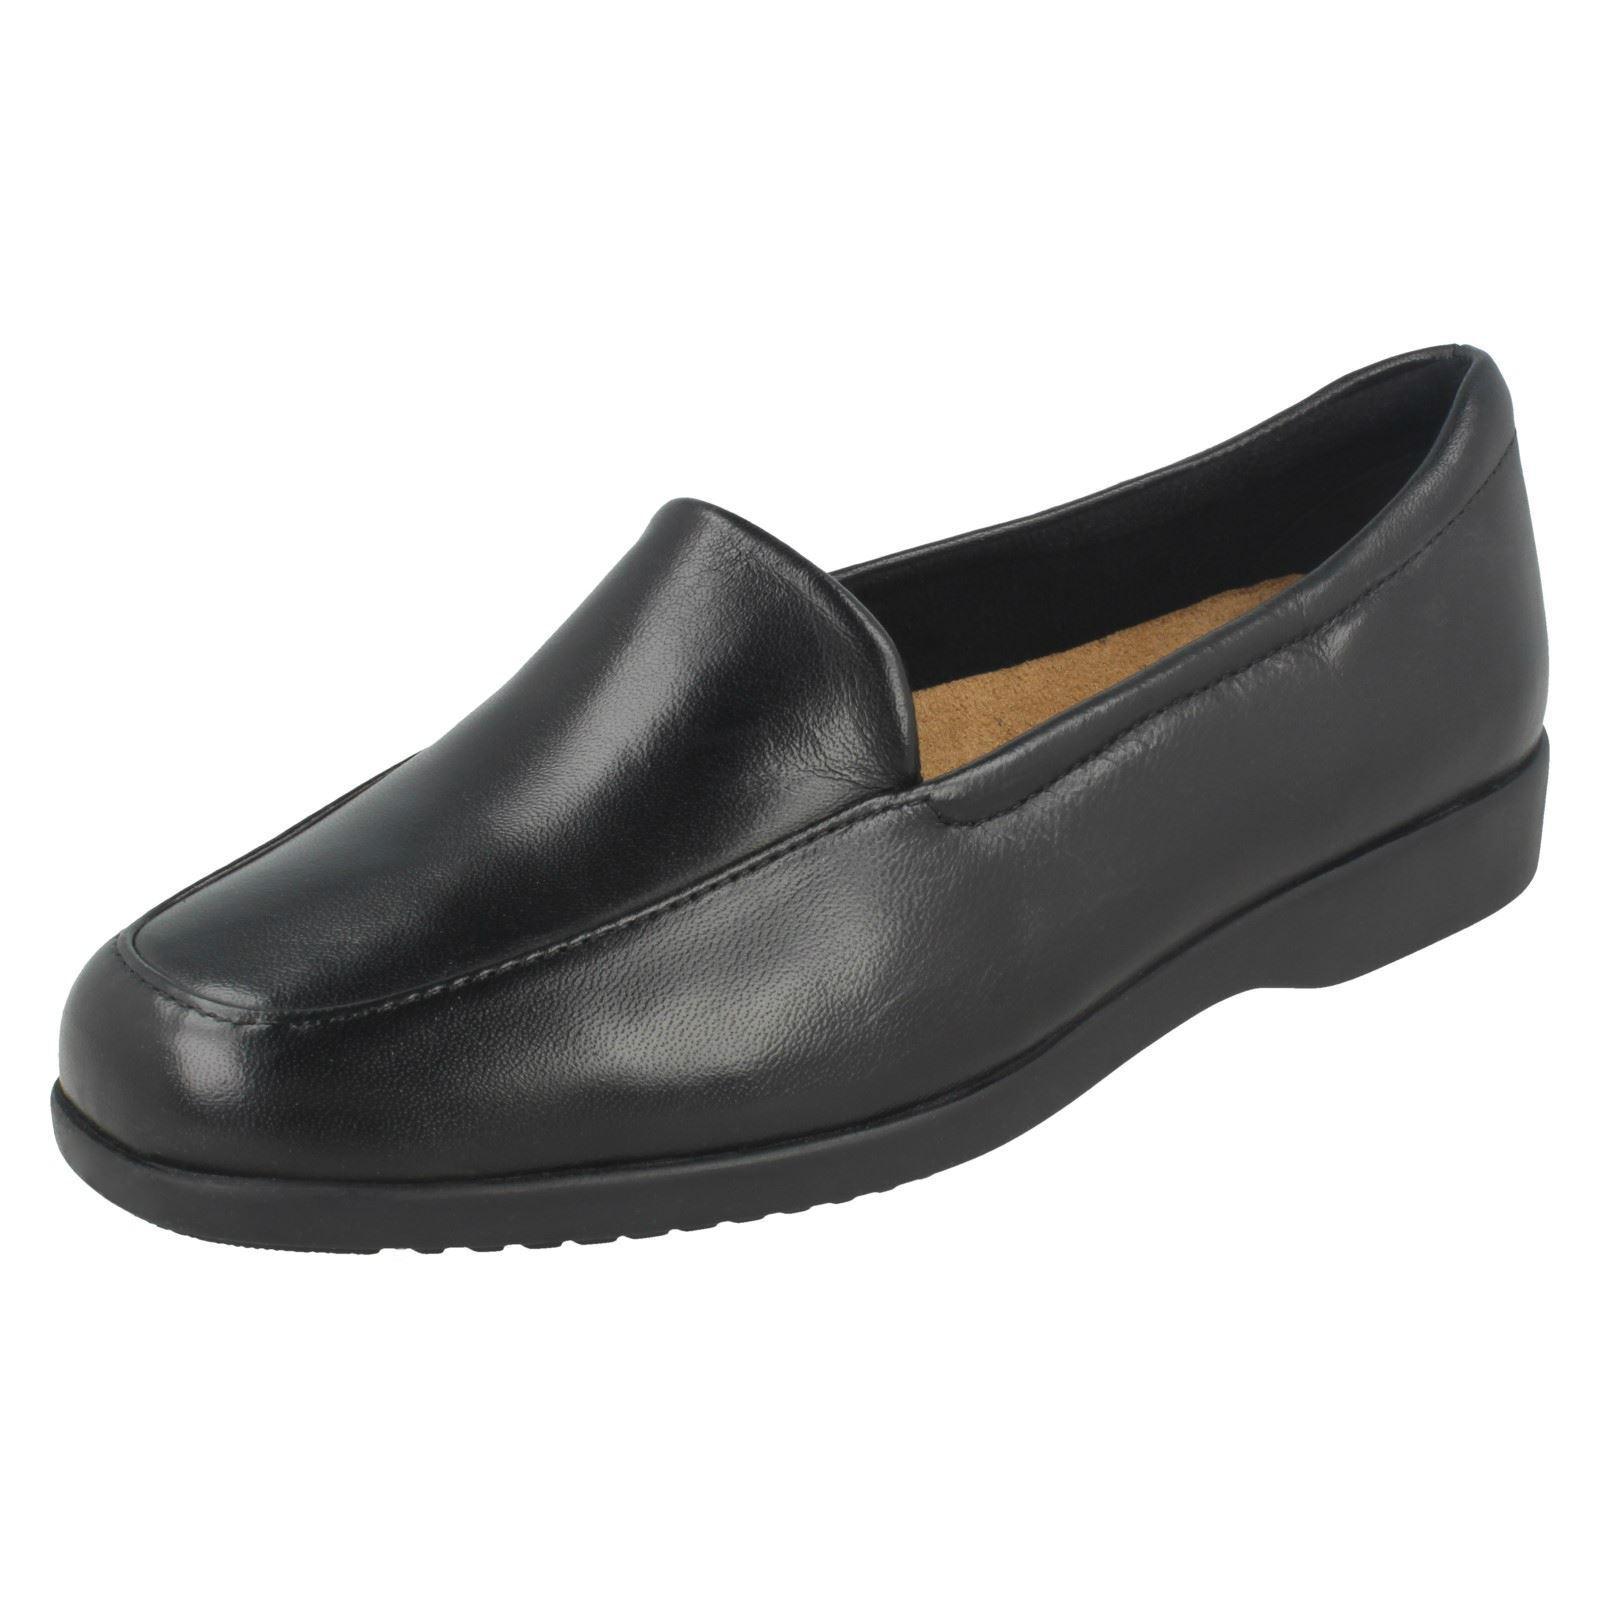 Ladies Clarks Flat Flat Flat Loafer Style shoes Georgia dd8c97